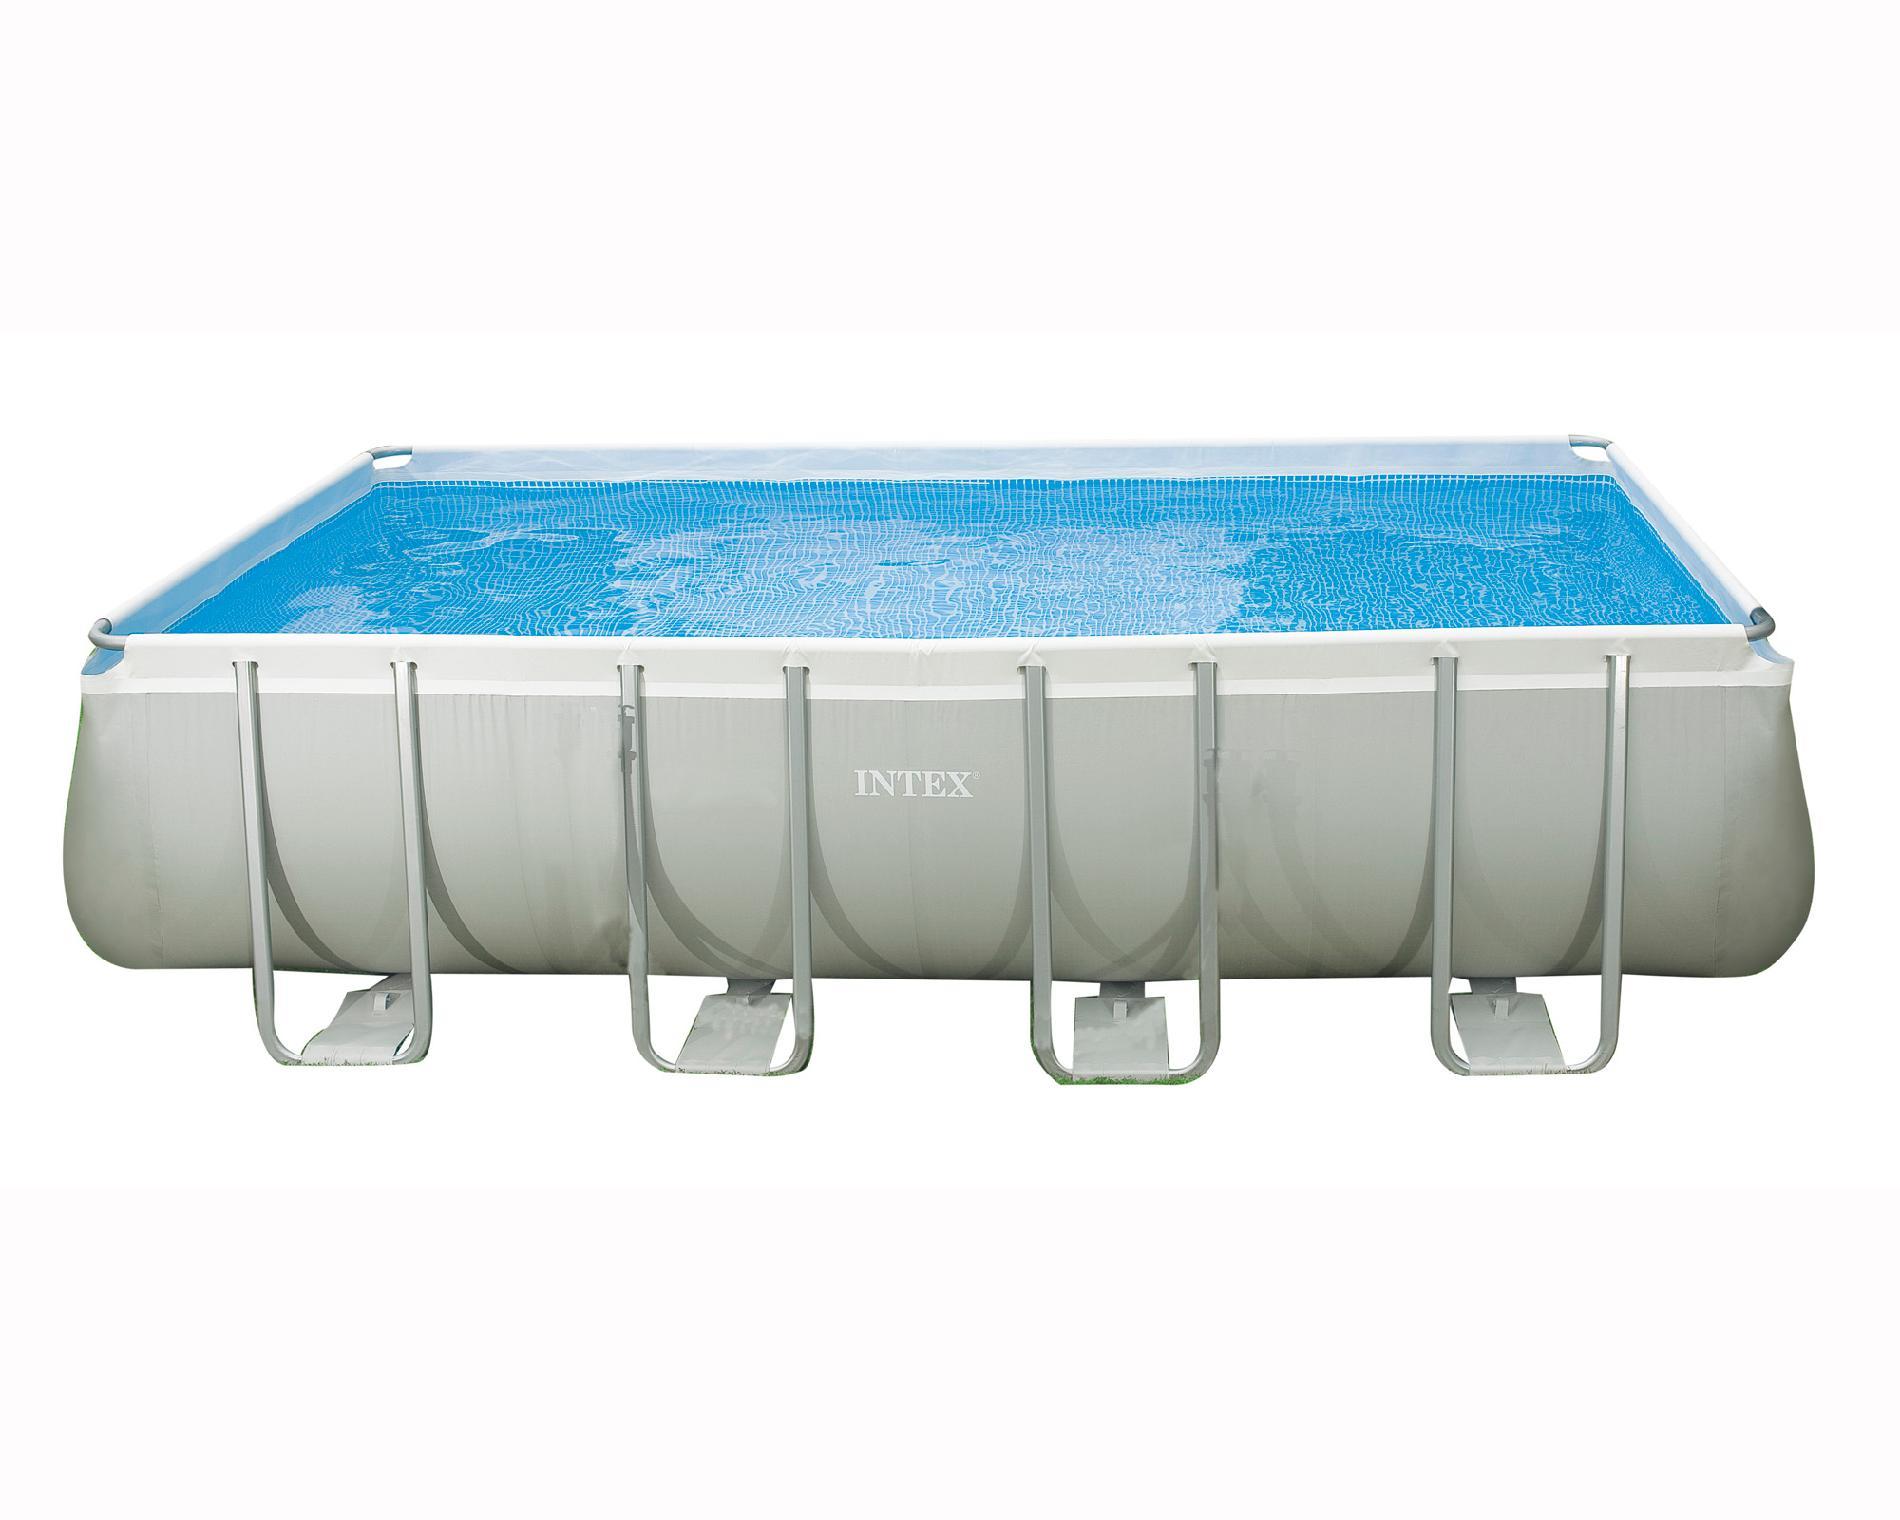 Intex Rectangular Ultra Frame Above Ground Pool Backyard